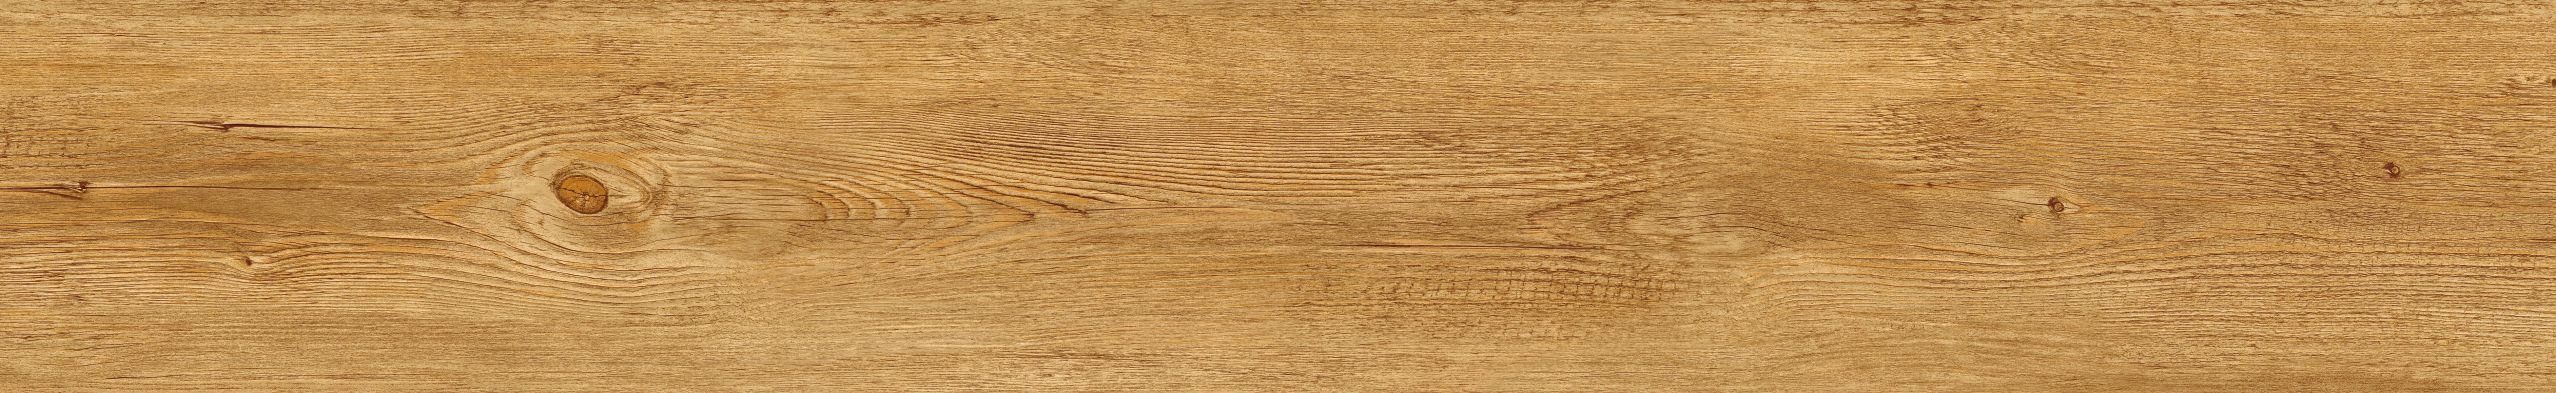 Panele winylowe LVT modulari ® WOOD DRYBACK 19,6 x 132 cm 24832